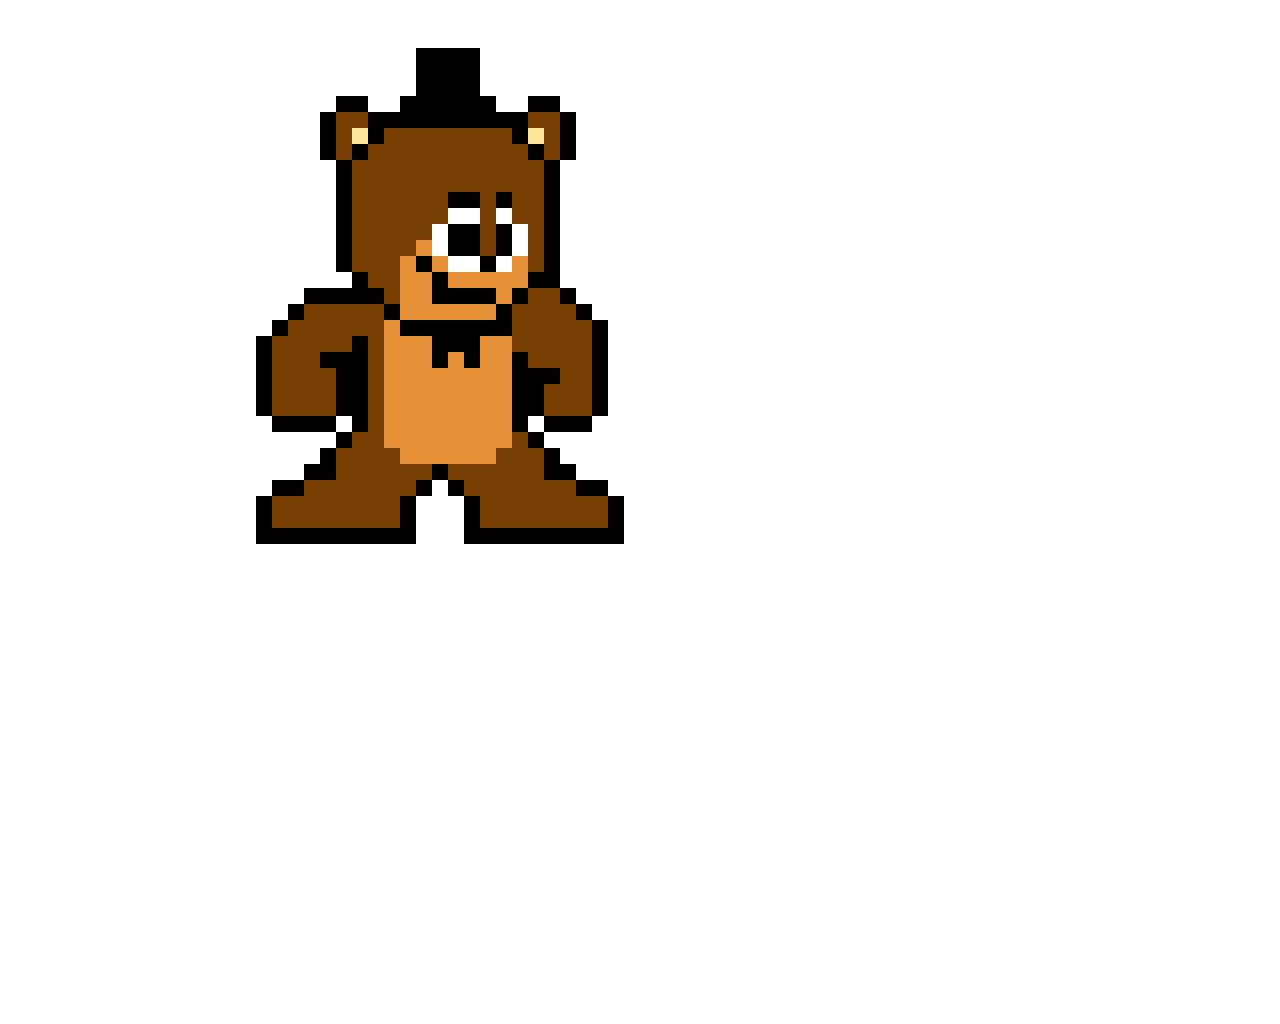 Freddy 8bit